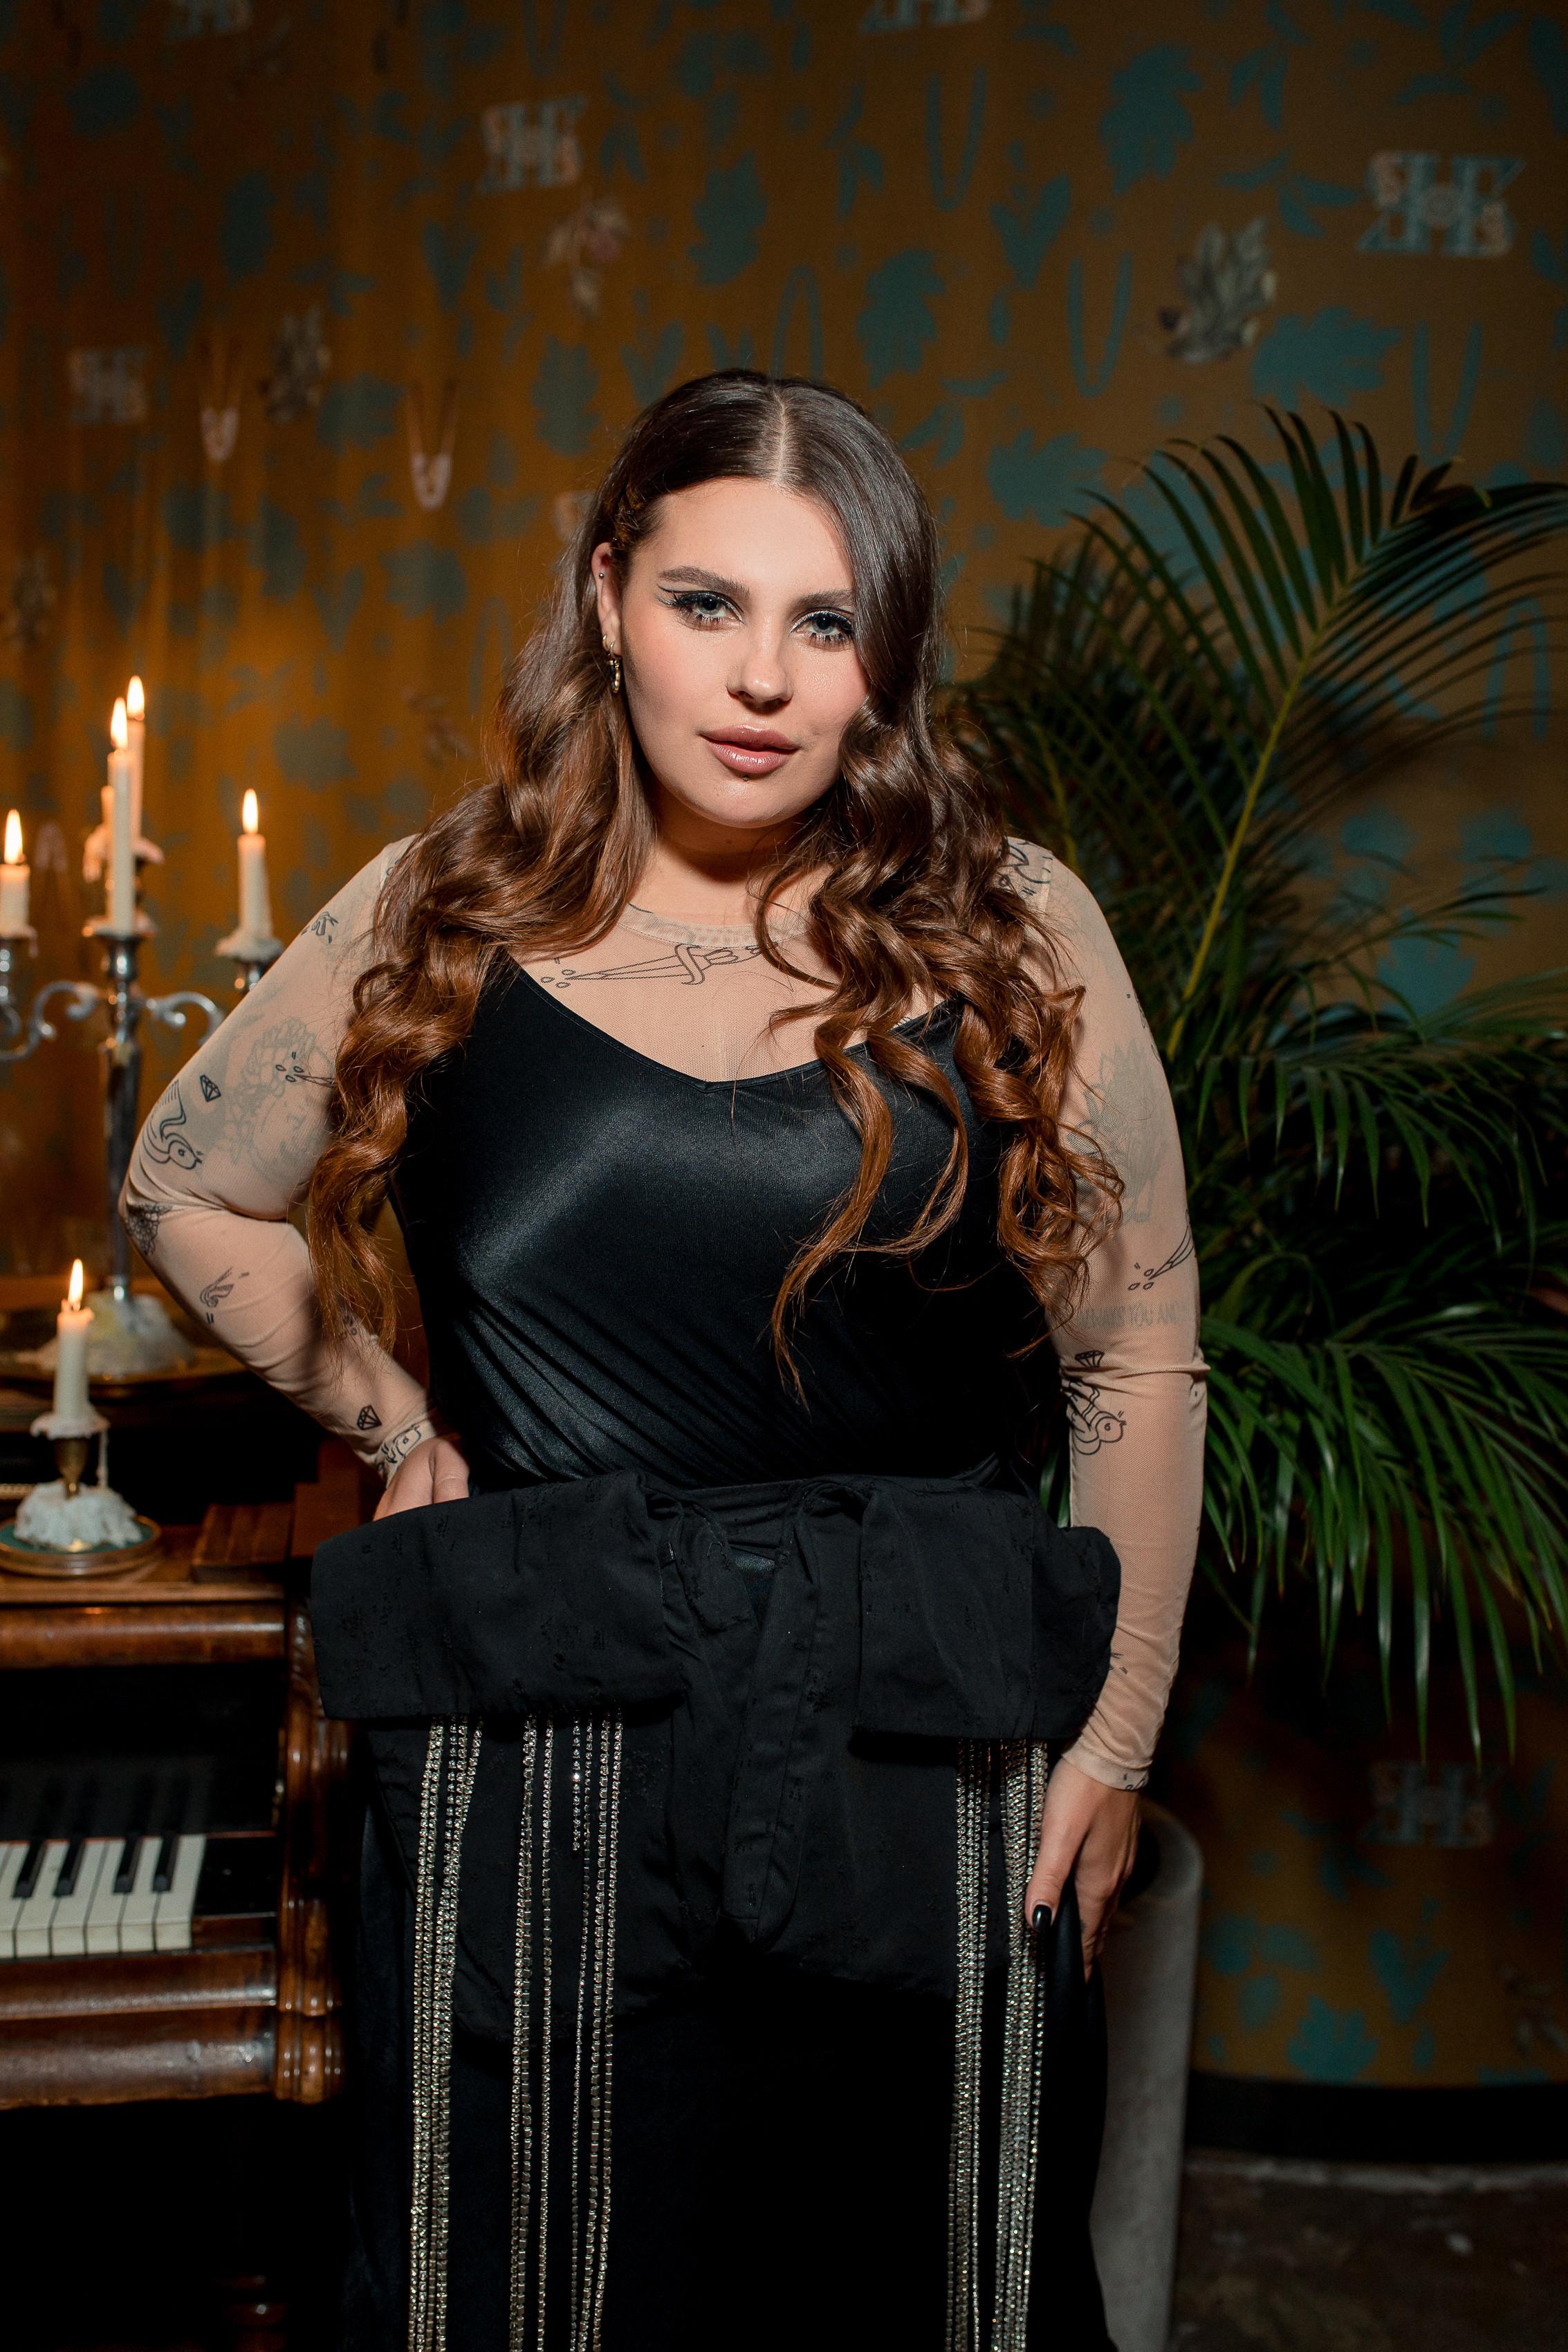 александра зарицкая участница шоу танцы со звездами